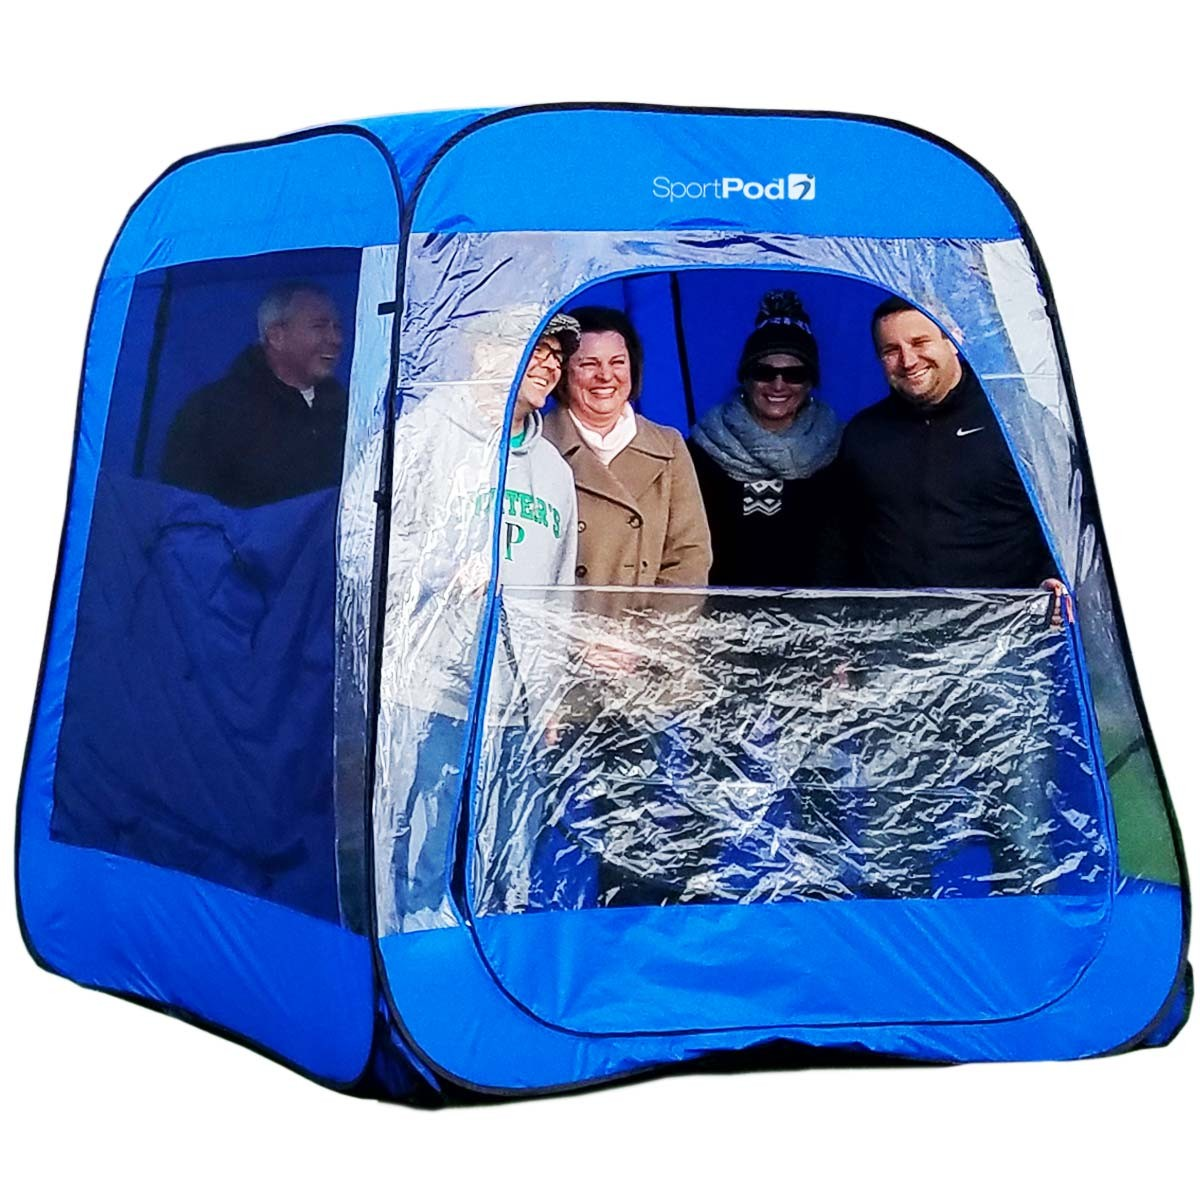 Teampod All Weather Sportpod Pop Up Chair Tent A00 202